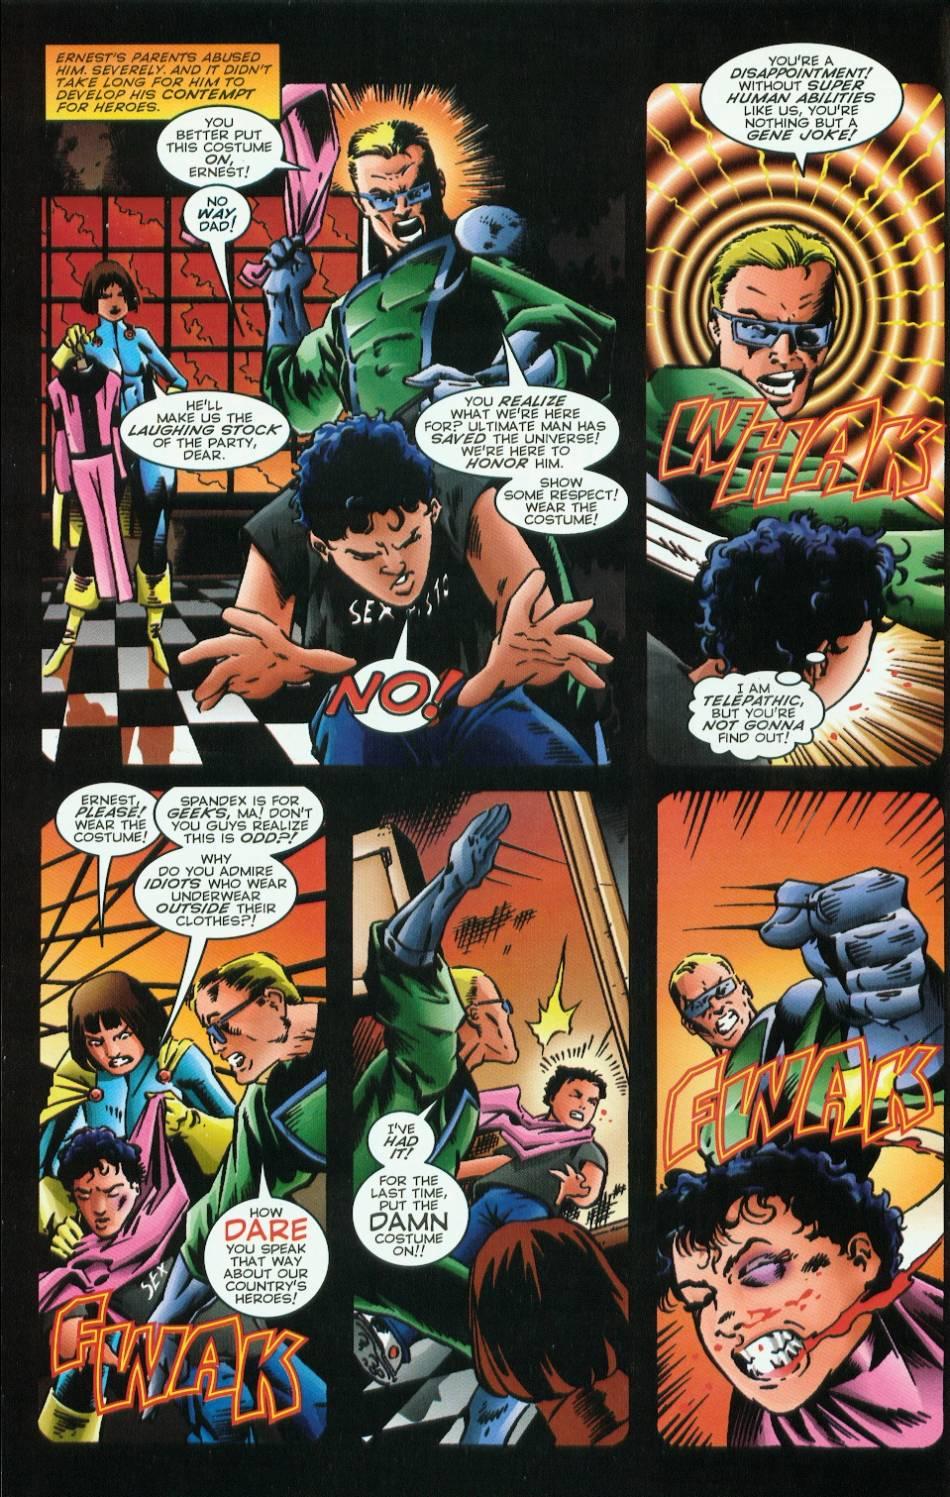 Read online Evil Ernie vs. the Superheroes comic -  Issue #1 - 6